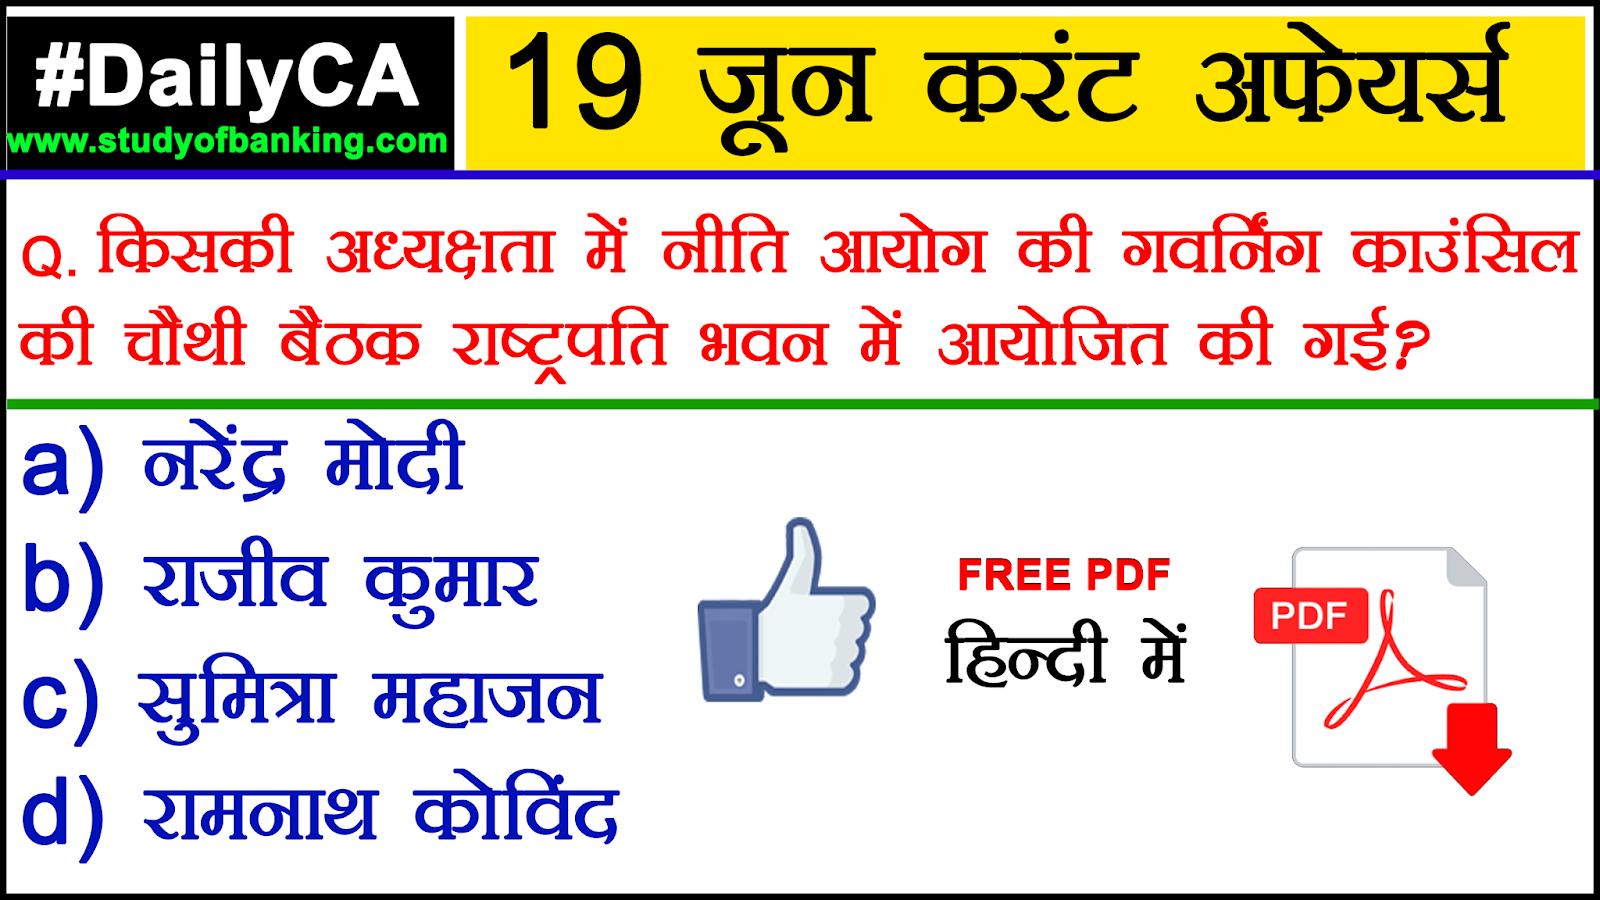 #DailyCA : 19 जून कर्रेंट अफेयर्स 2018 Quiz in Hindi